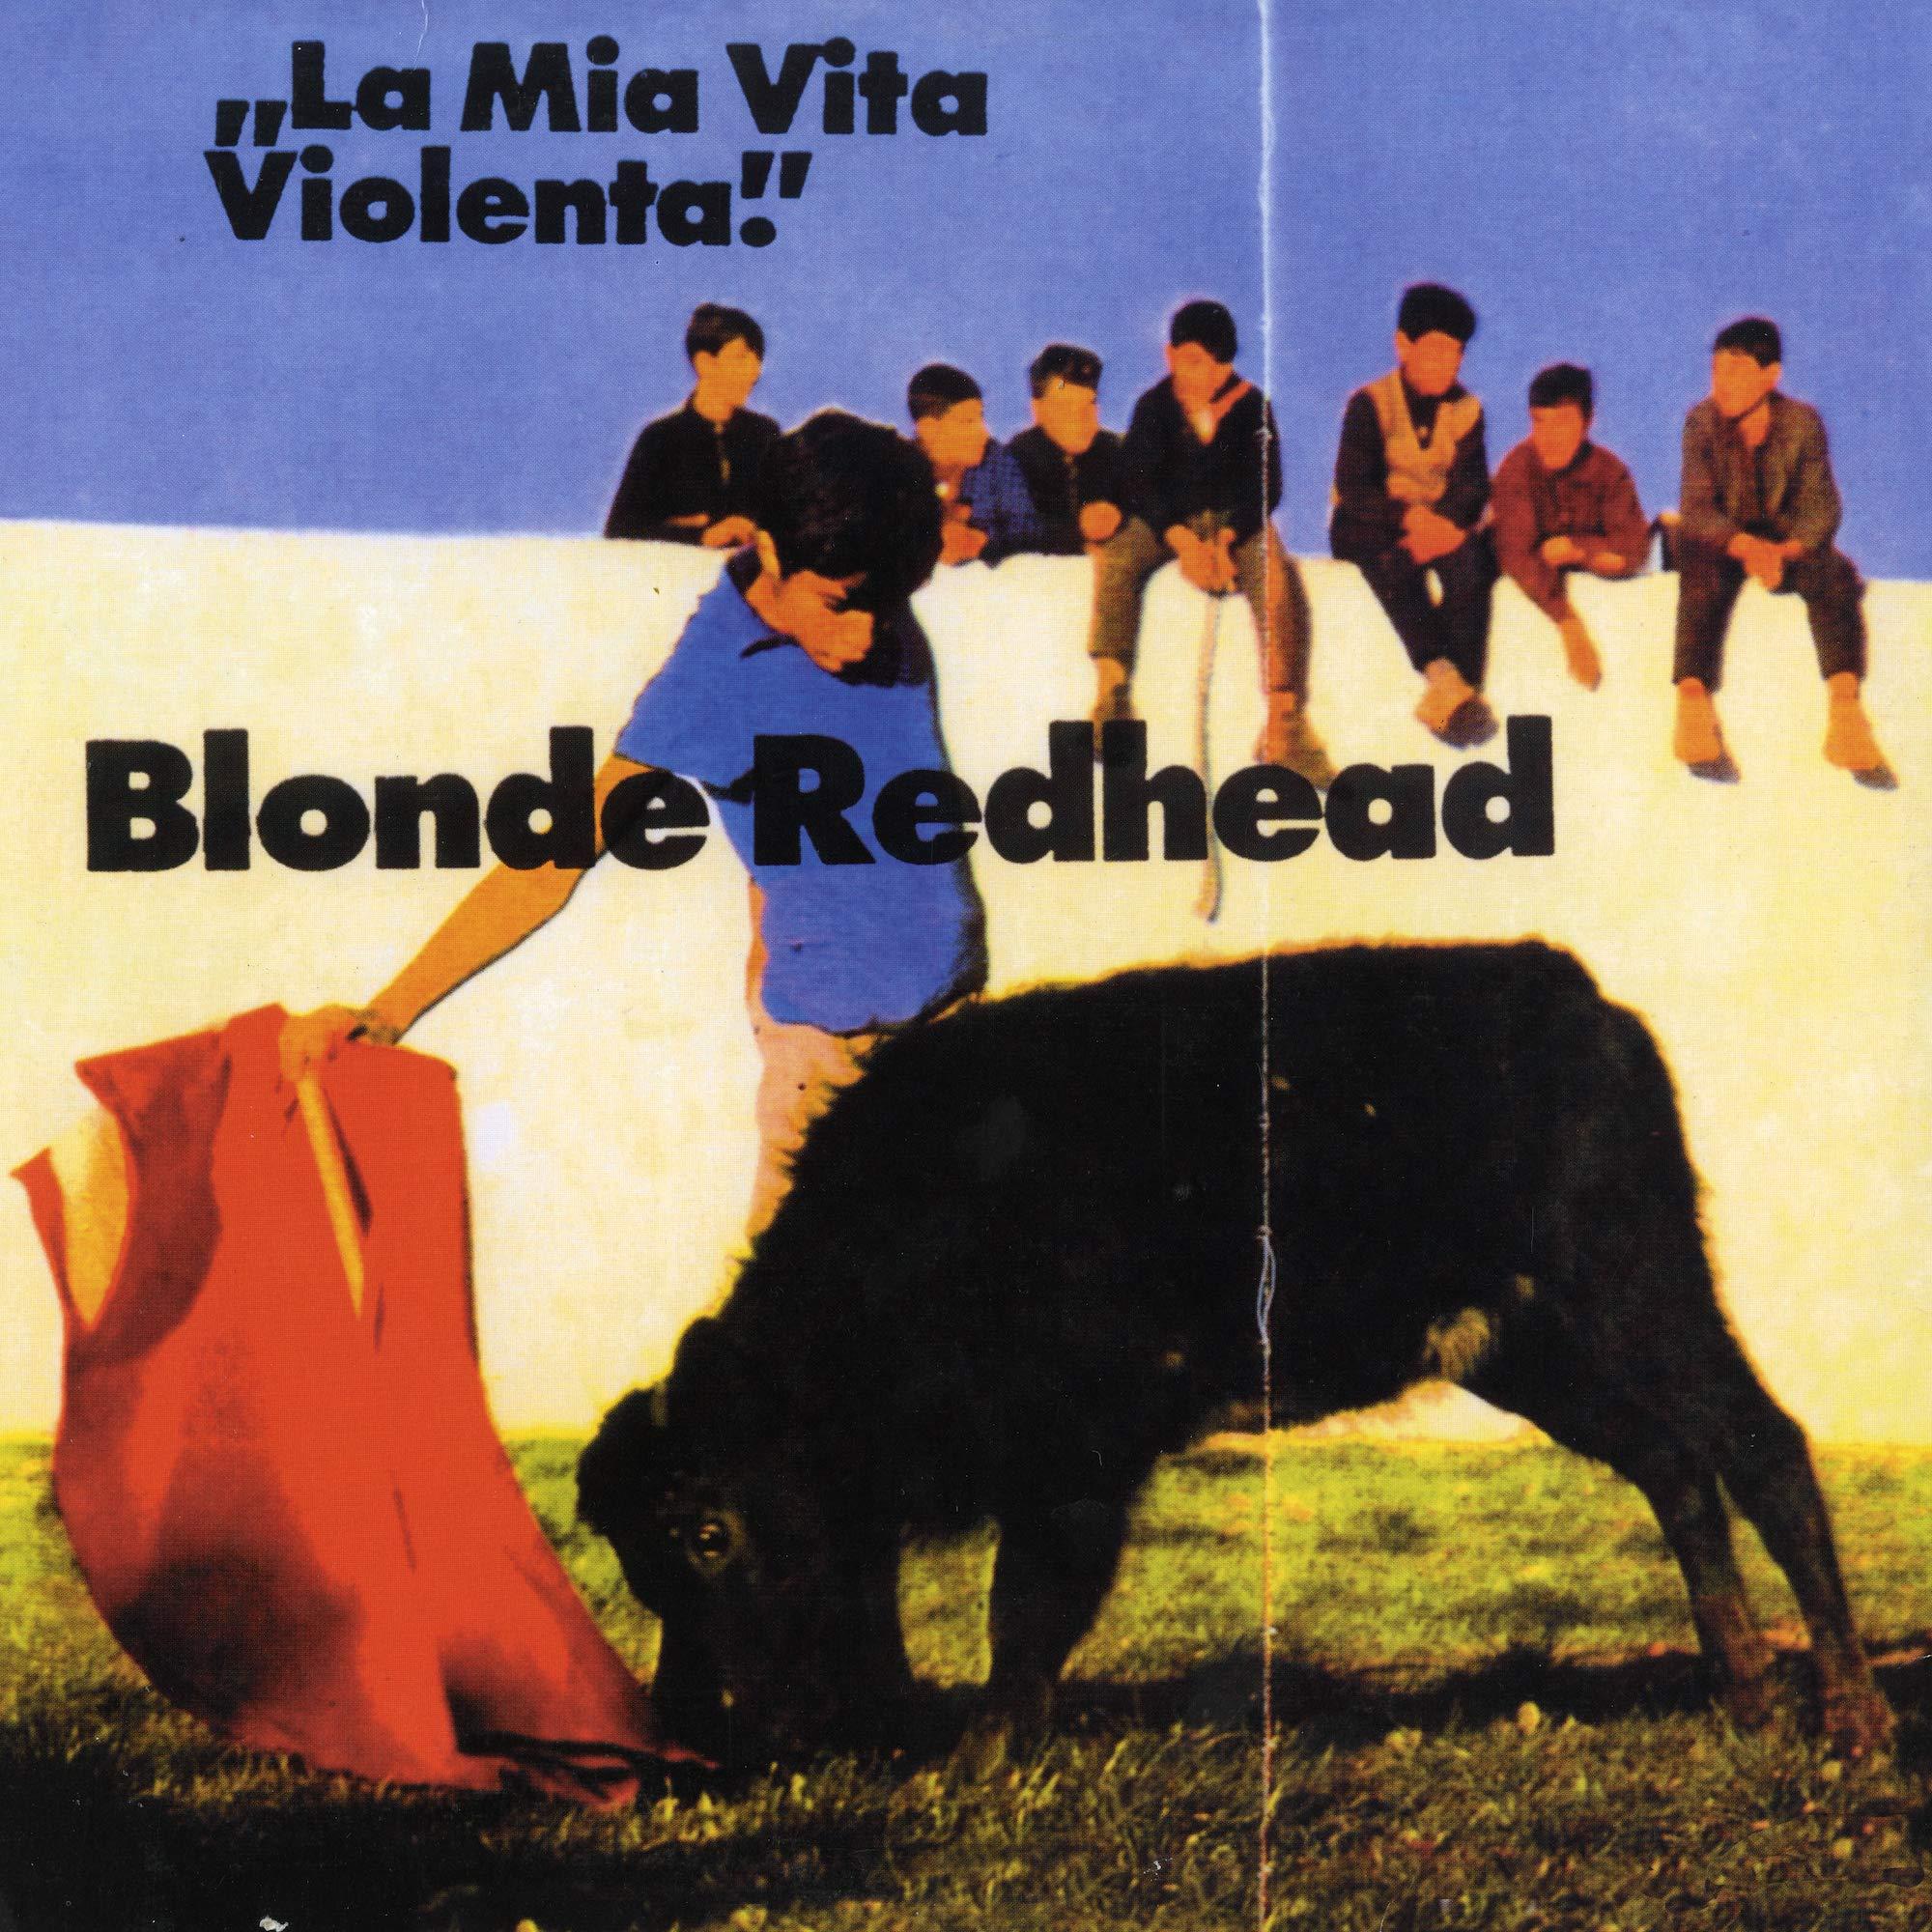 Blonde Redhead – La Mia Vita Violenta (1995) [FLAC]